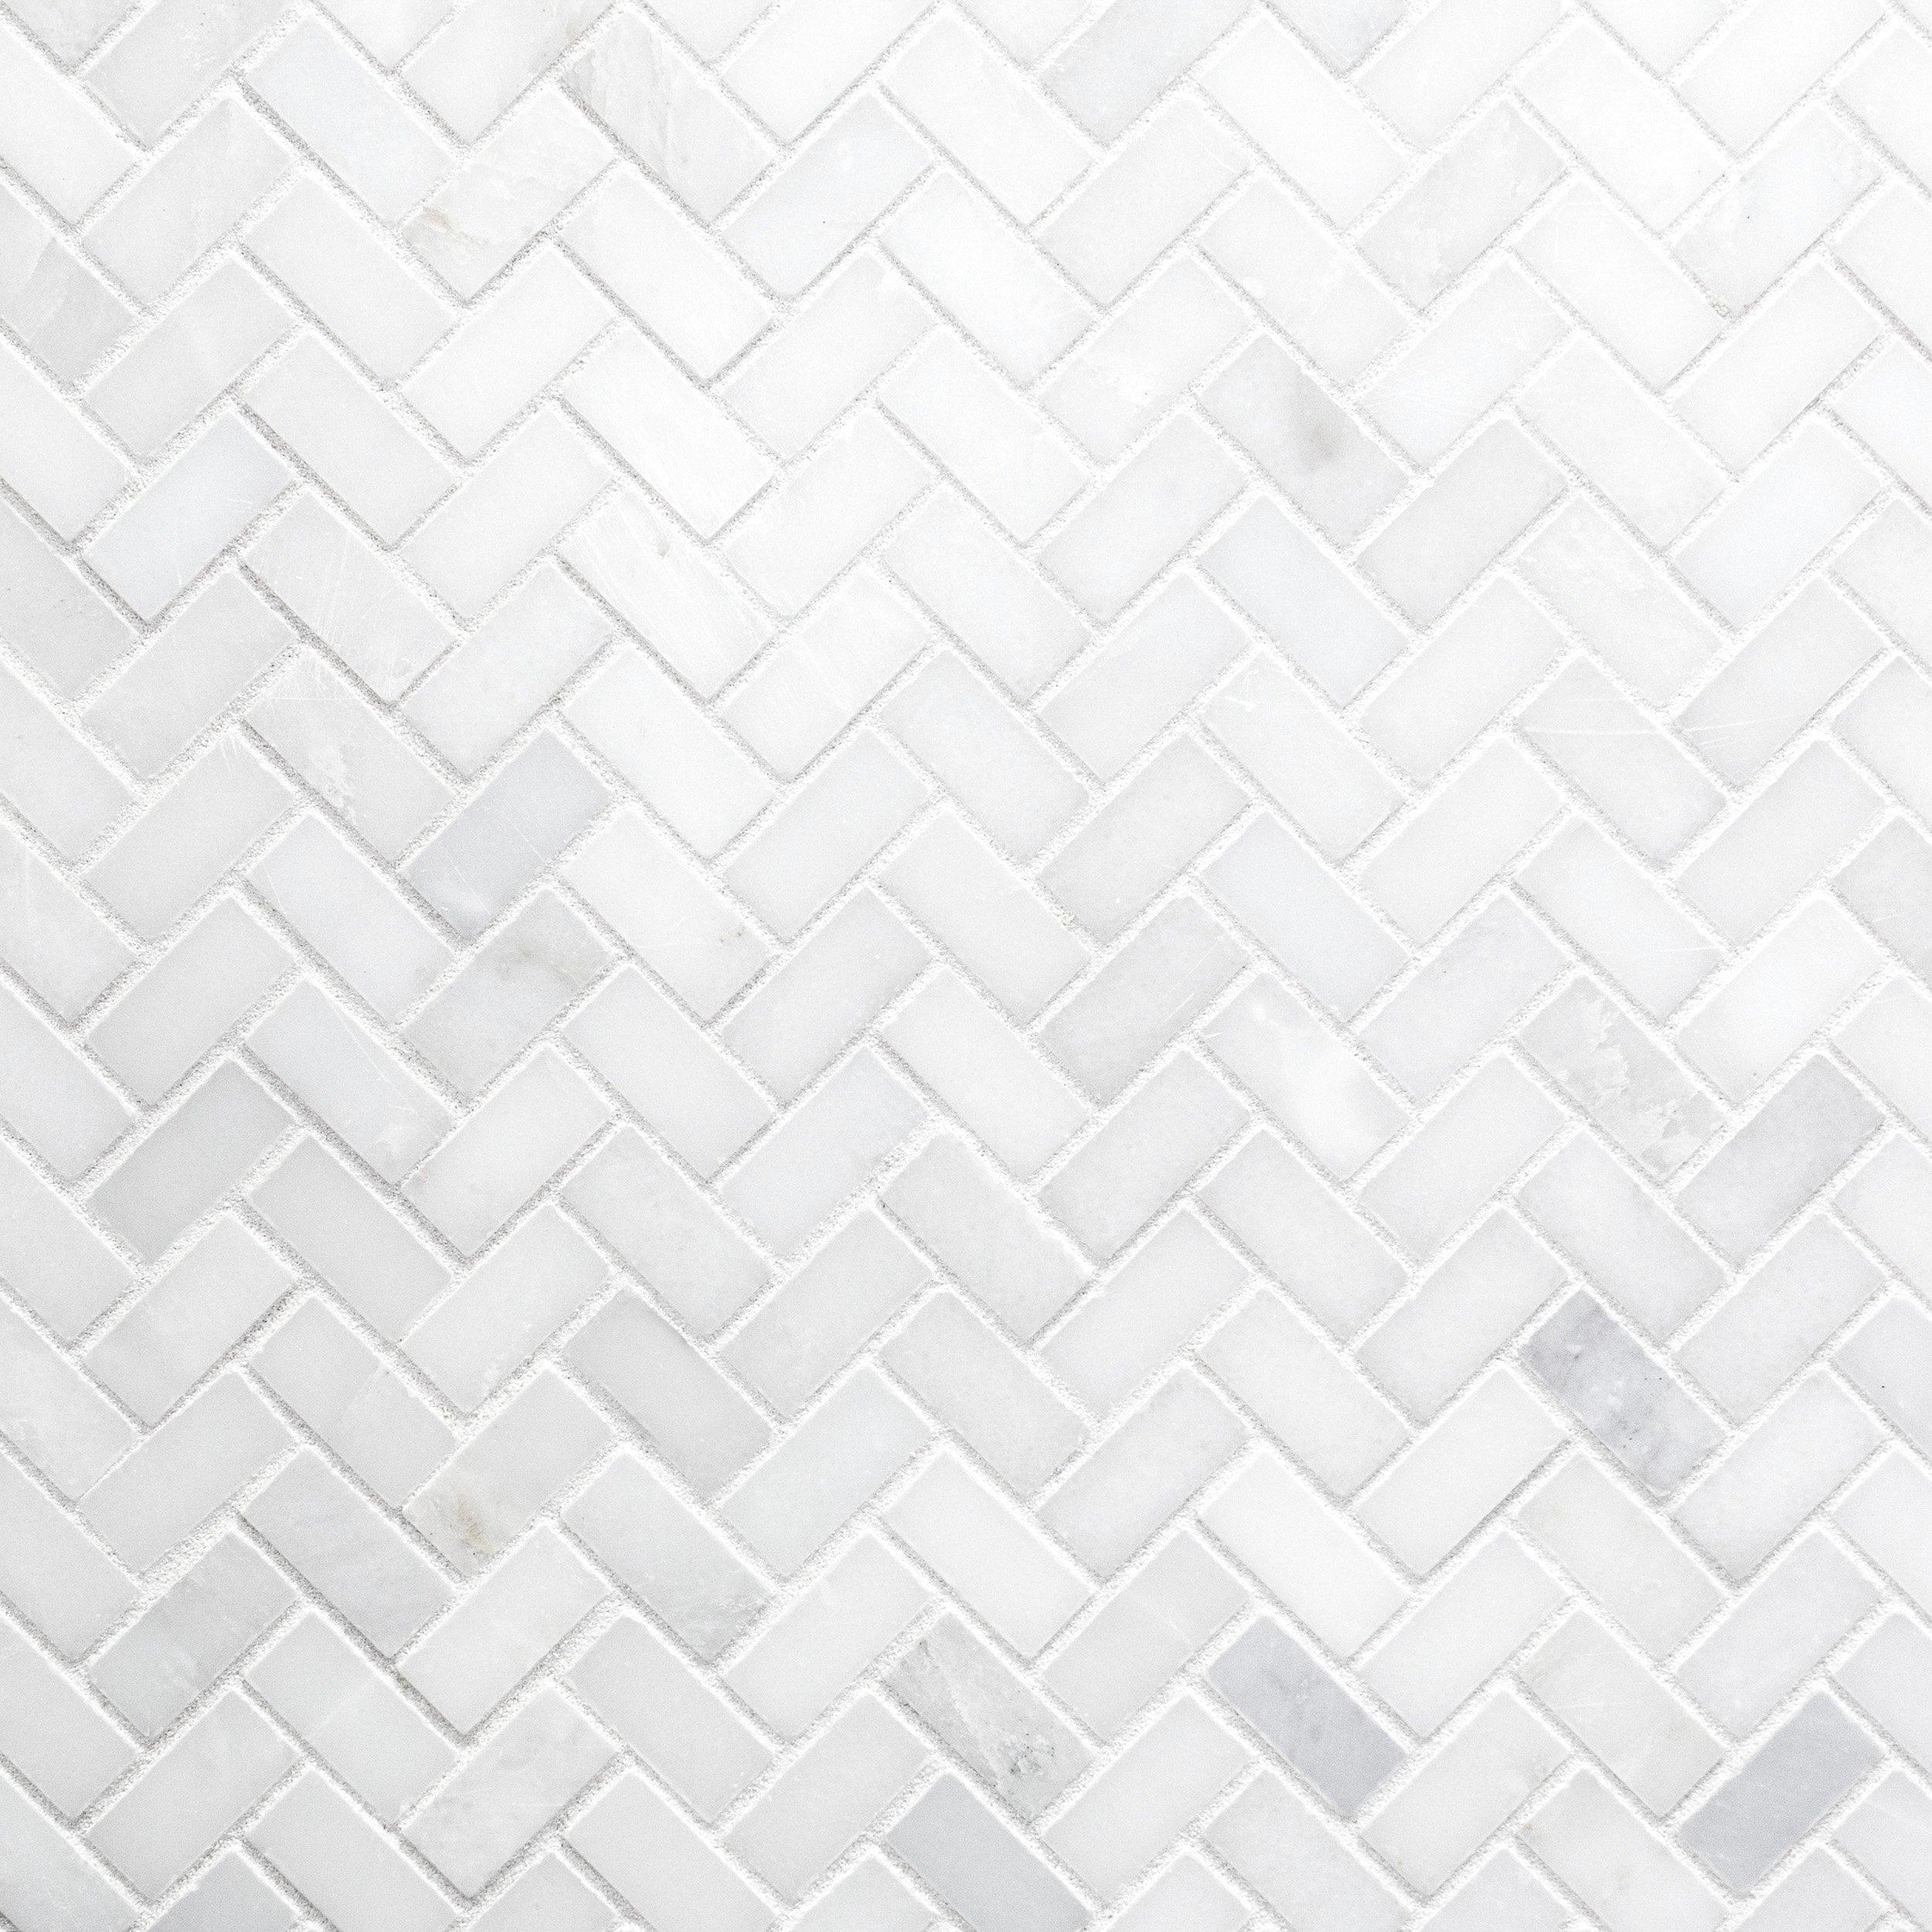 Carrara White Herringbone Marble Mosaic 12 X 12 931100243 Floor And Decor